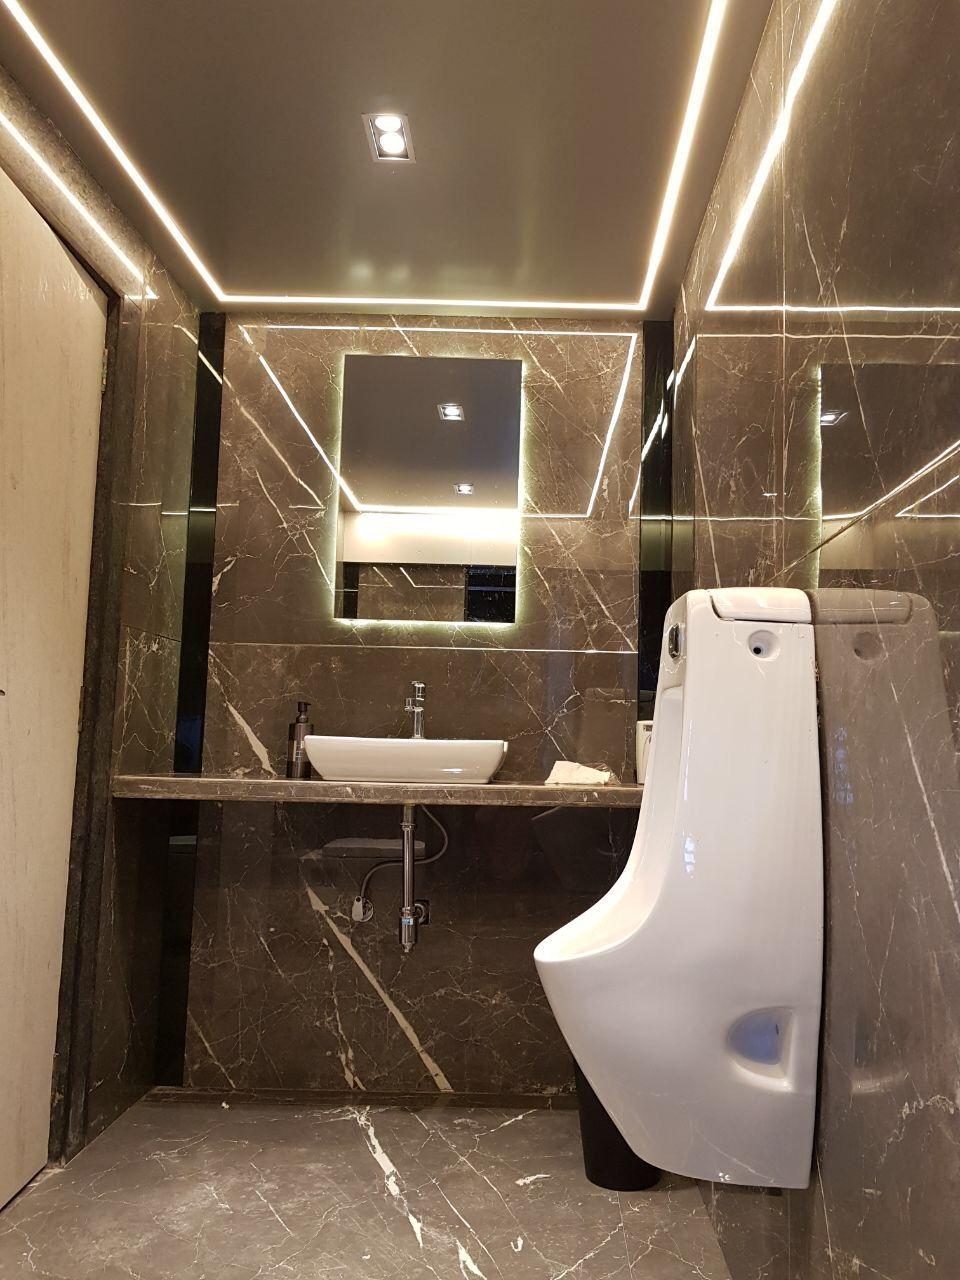 Washroom Italianlook Profilelight Mirror Modern Ideas